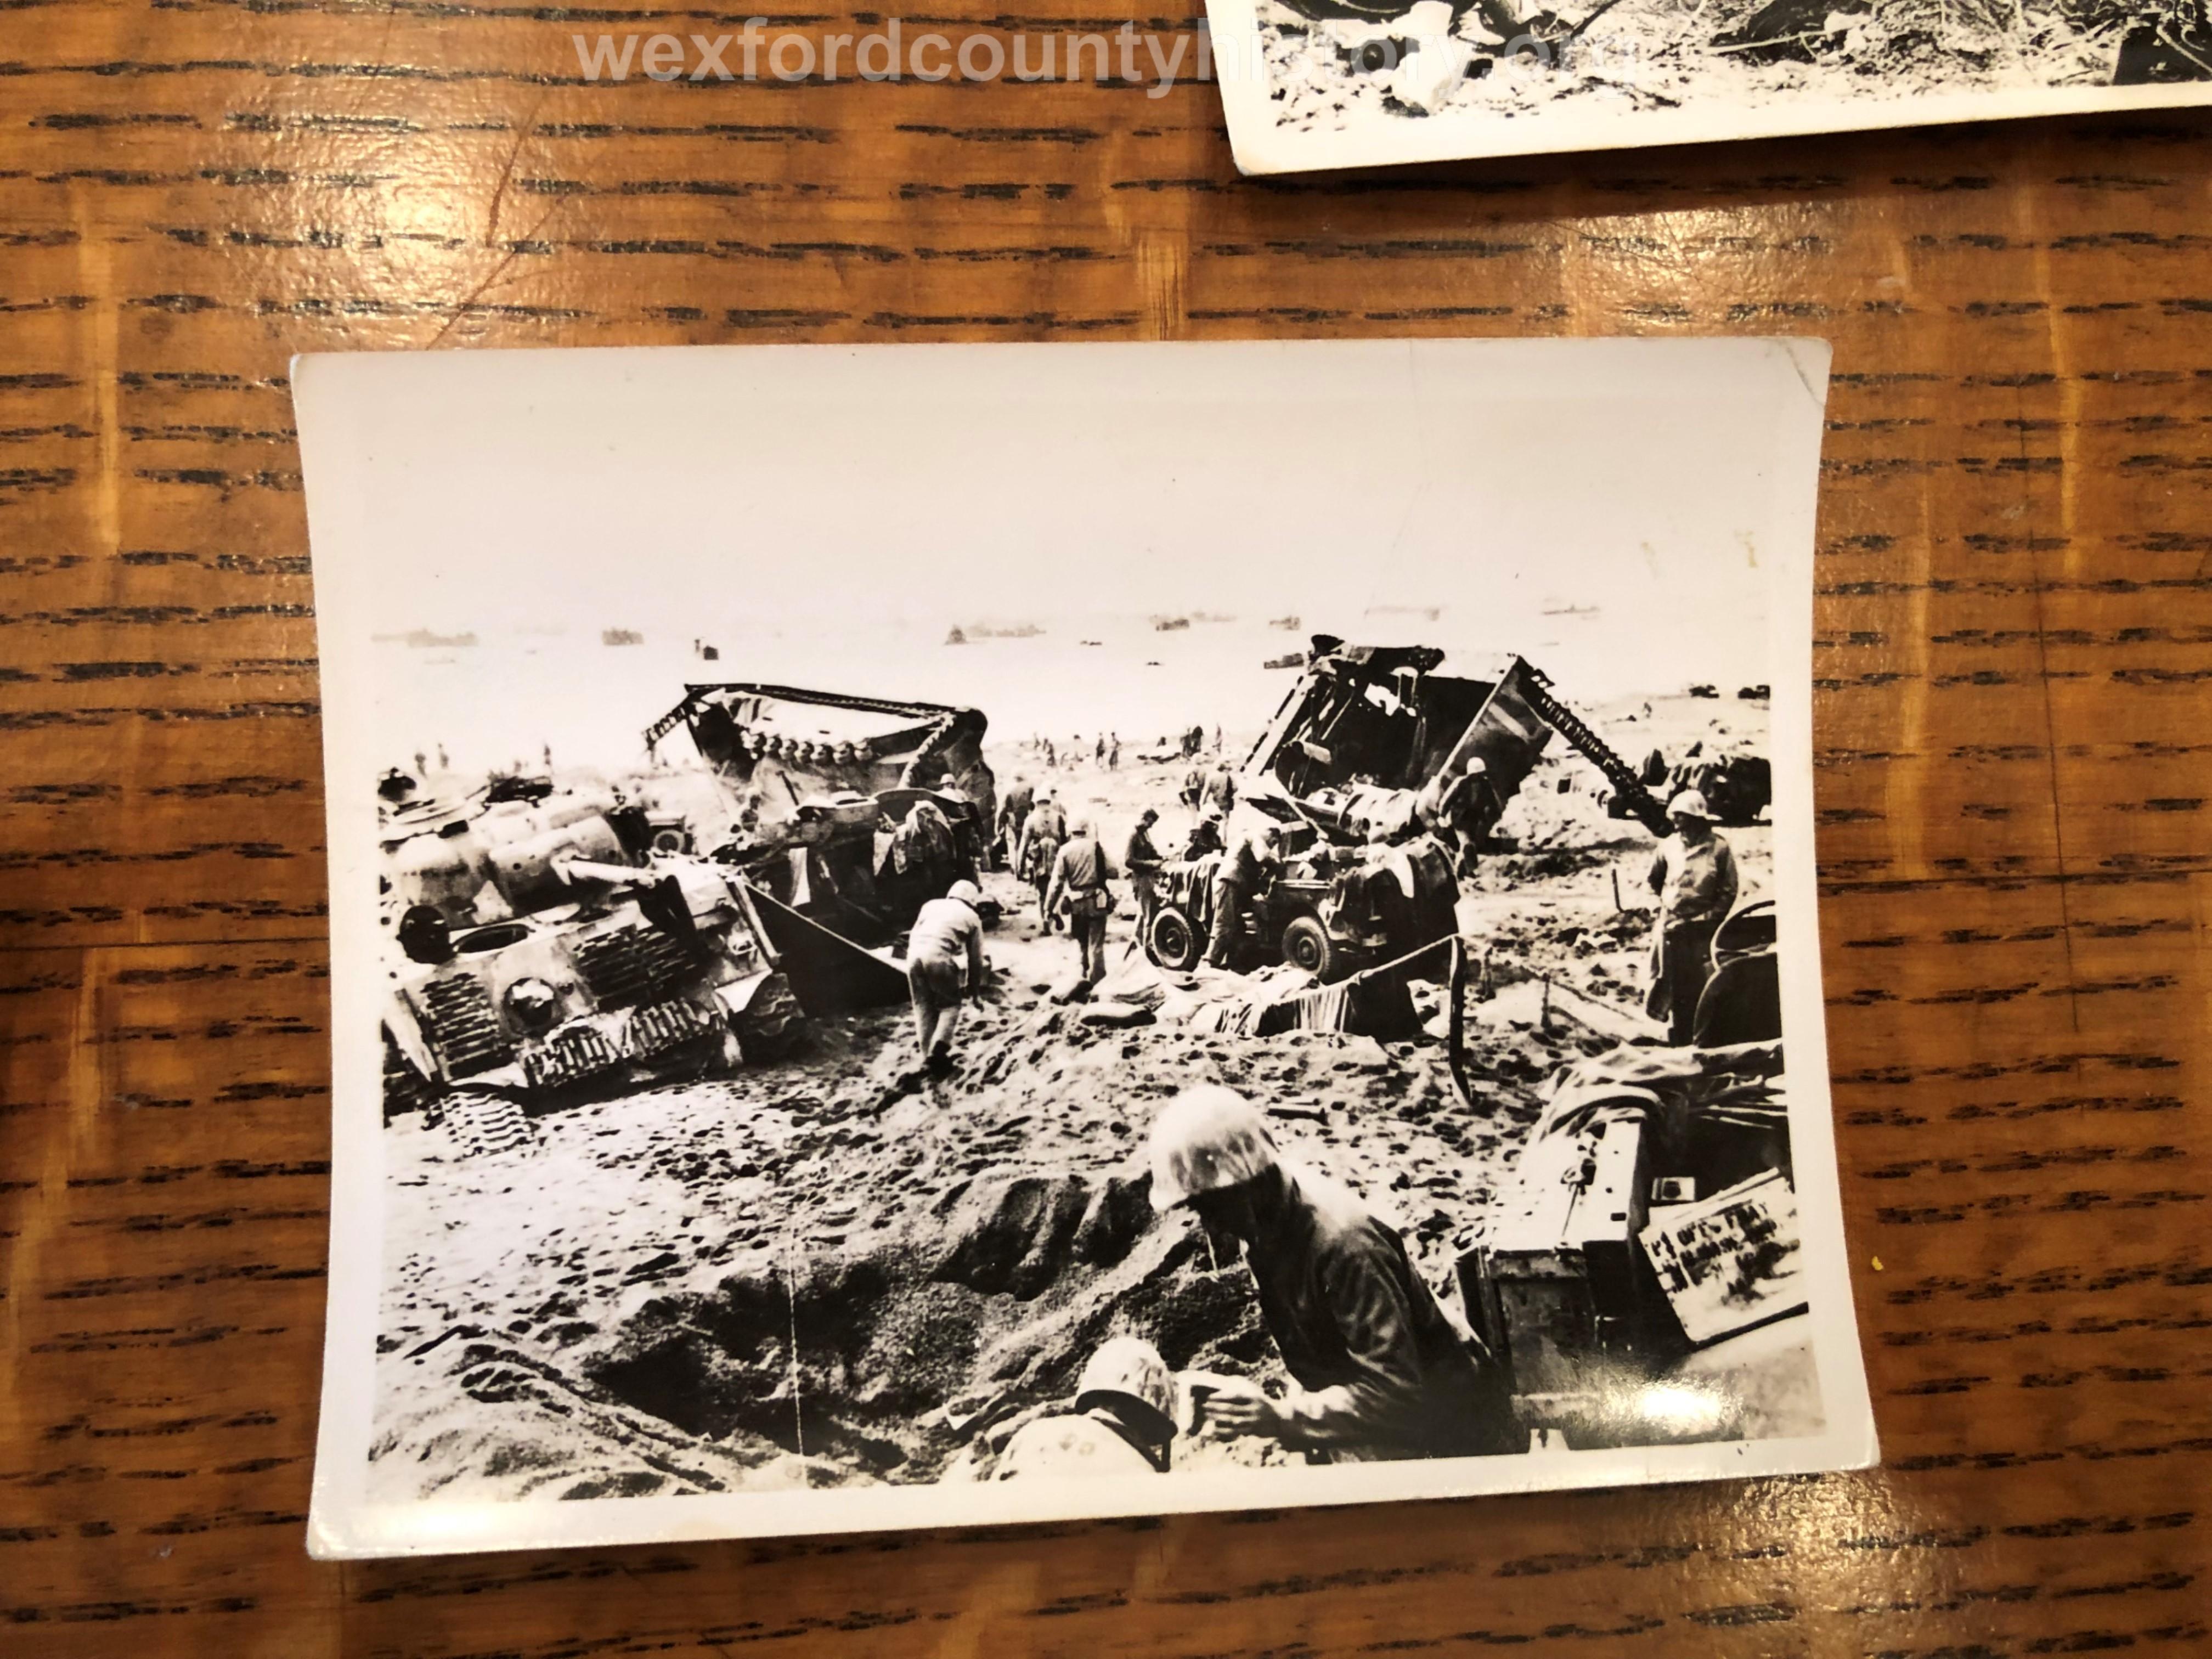 Cadillac-Veterans-Paul-Johnson-World-War-2-Photographs-36